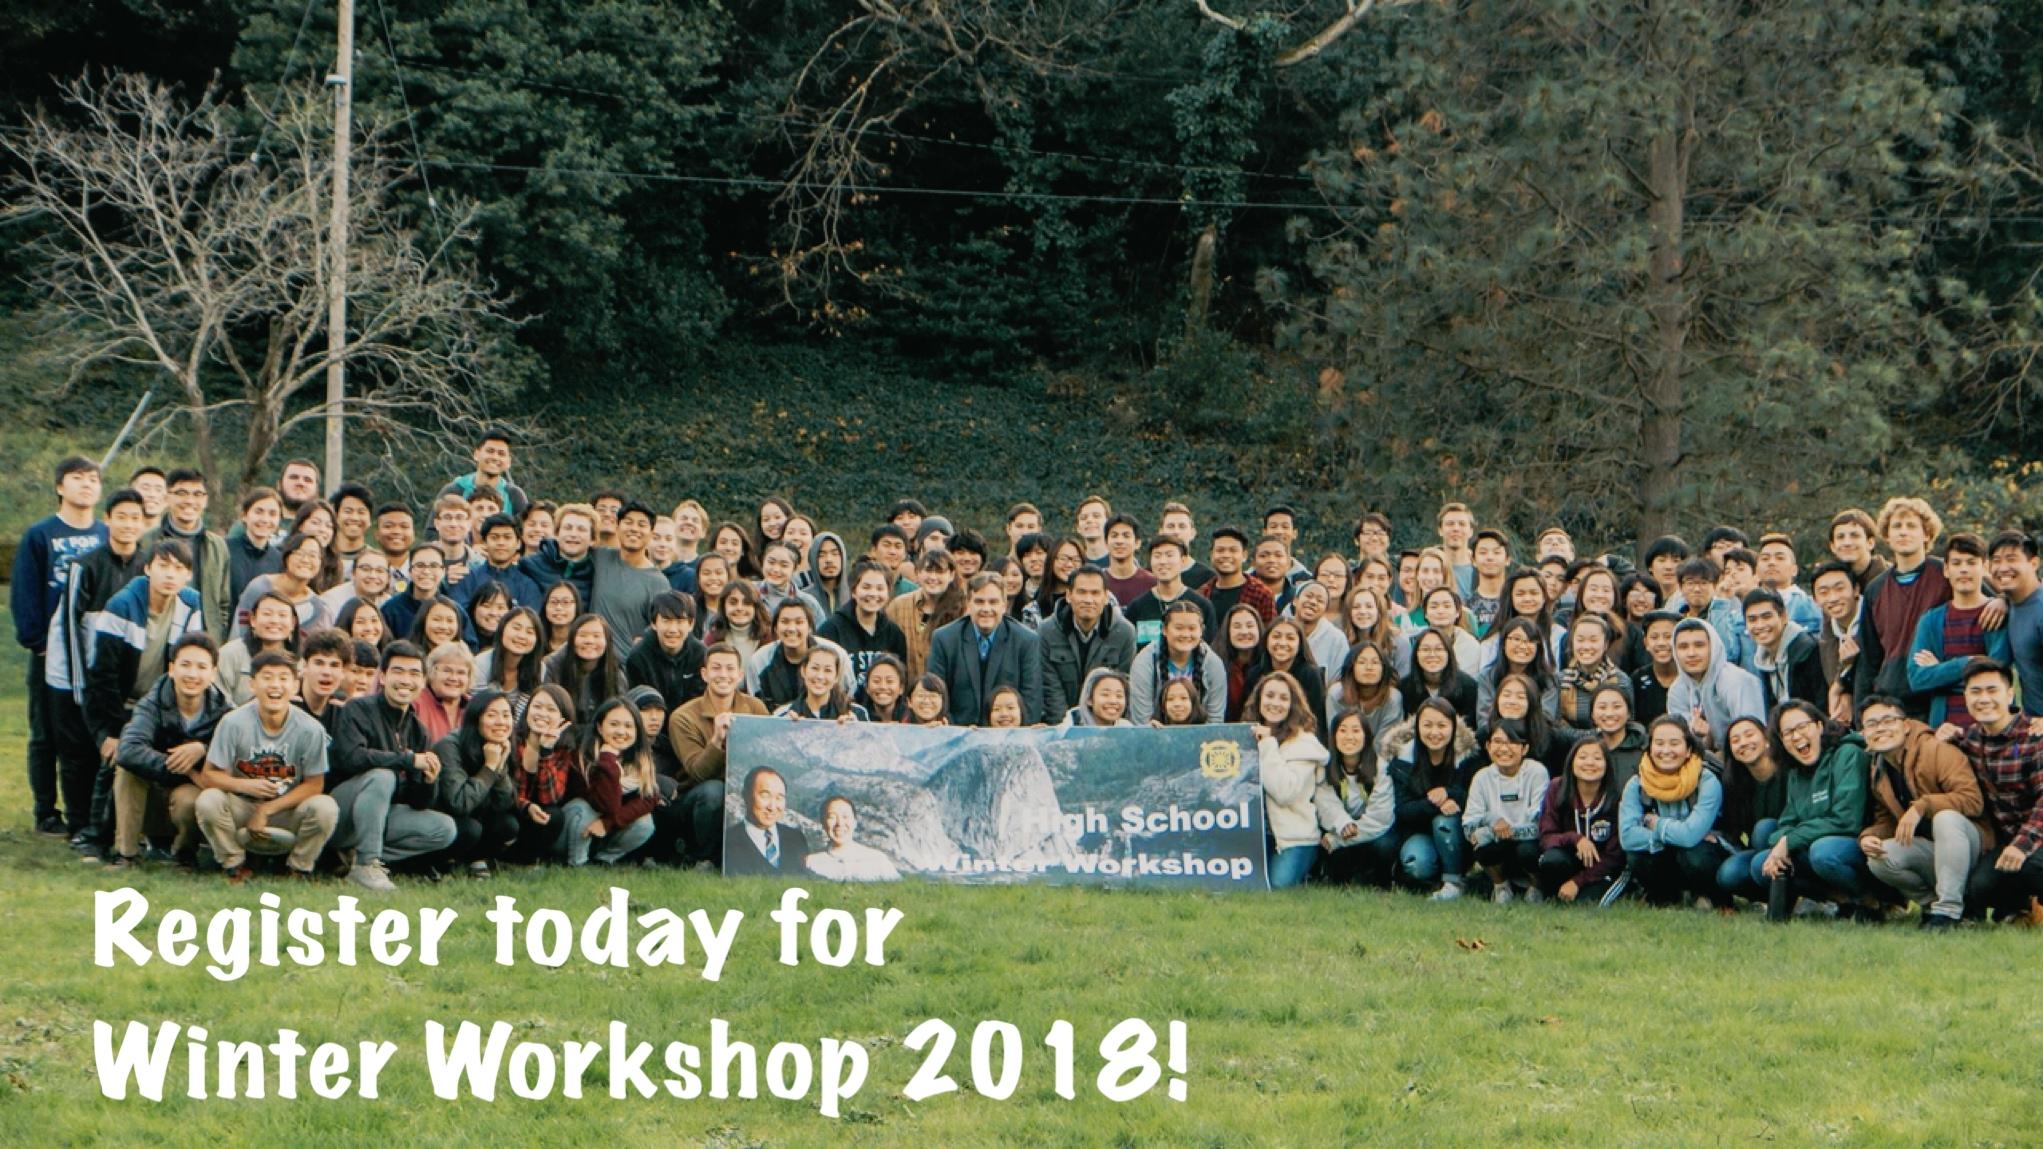 WinterWorkshop2018-1.jpg